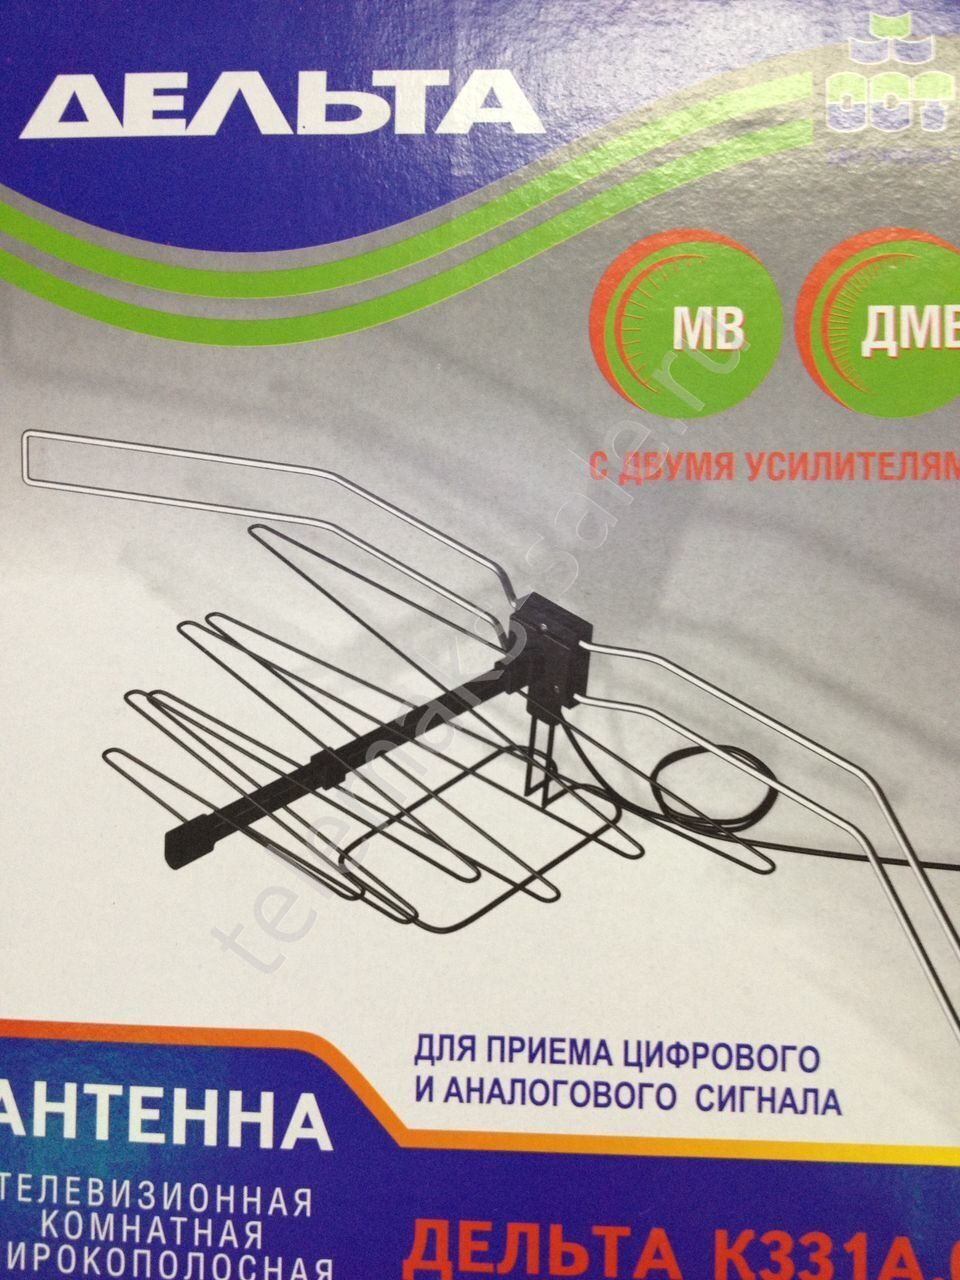 Комнатная антенна своими руками с усилителем